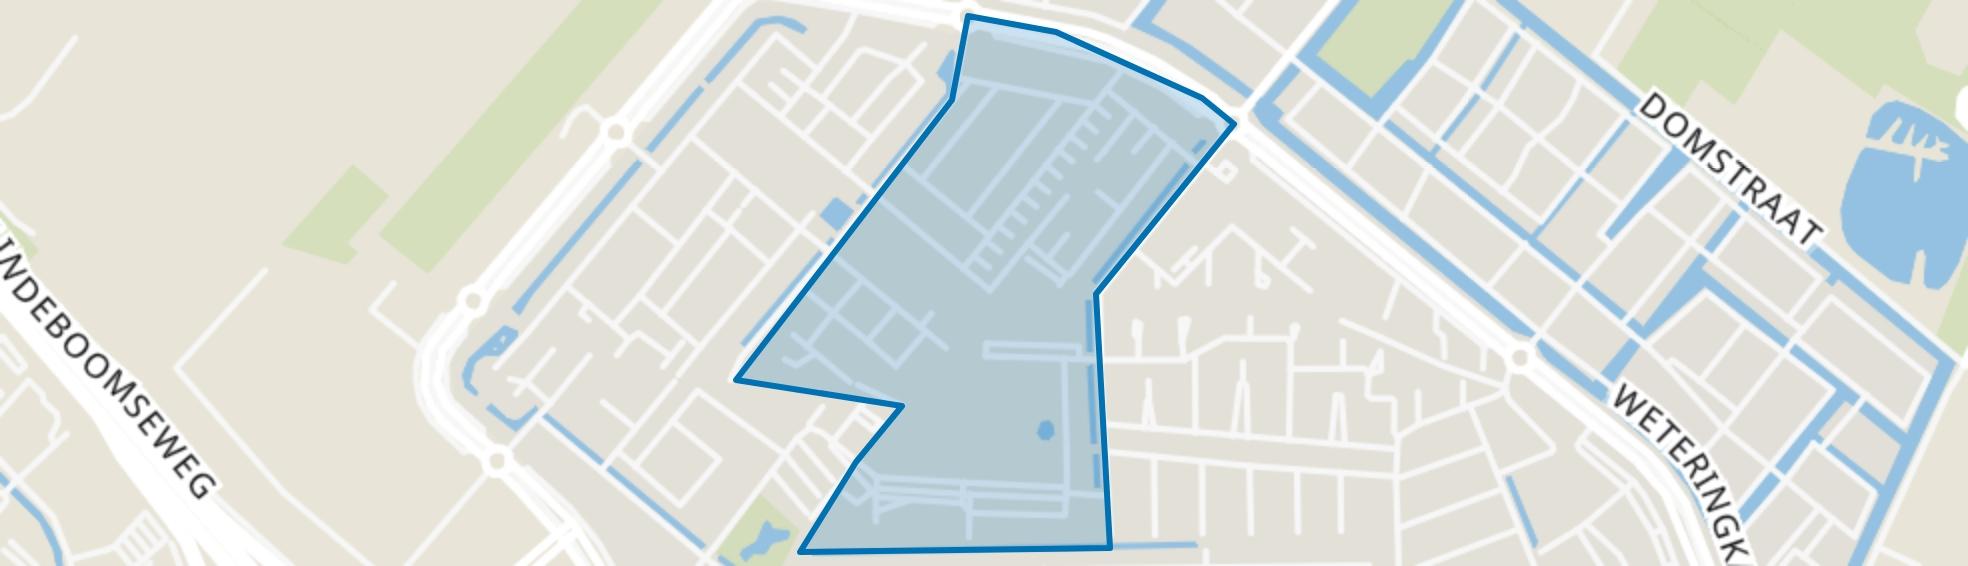 Sprengenberg, Amersfoort map